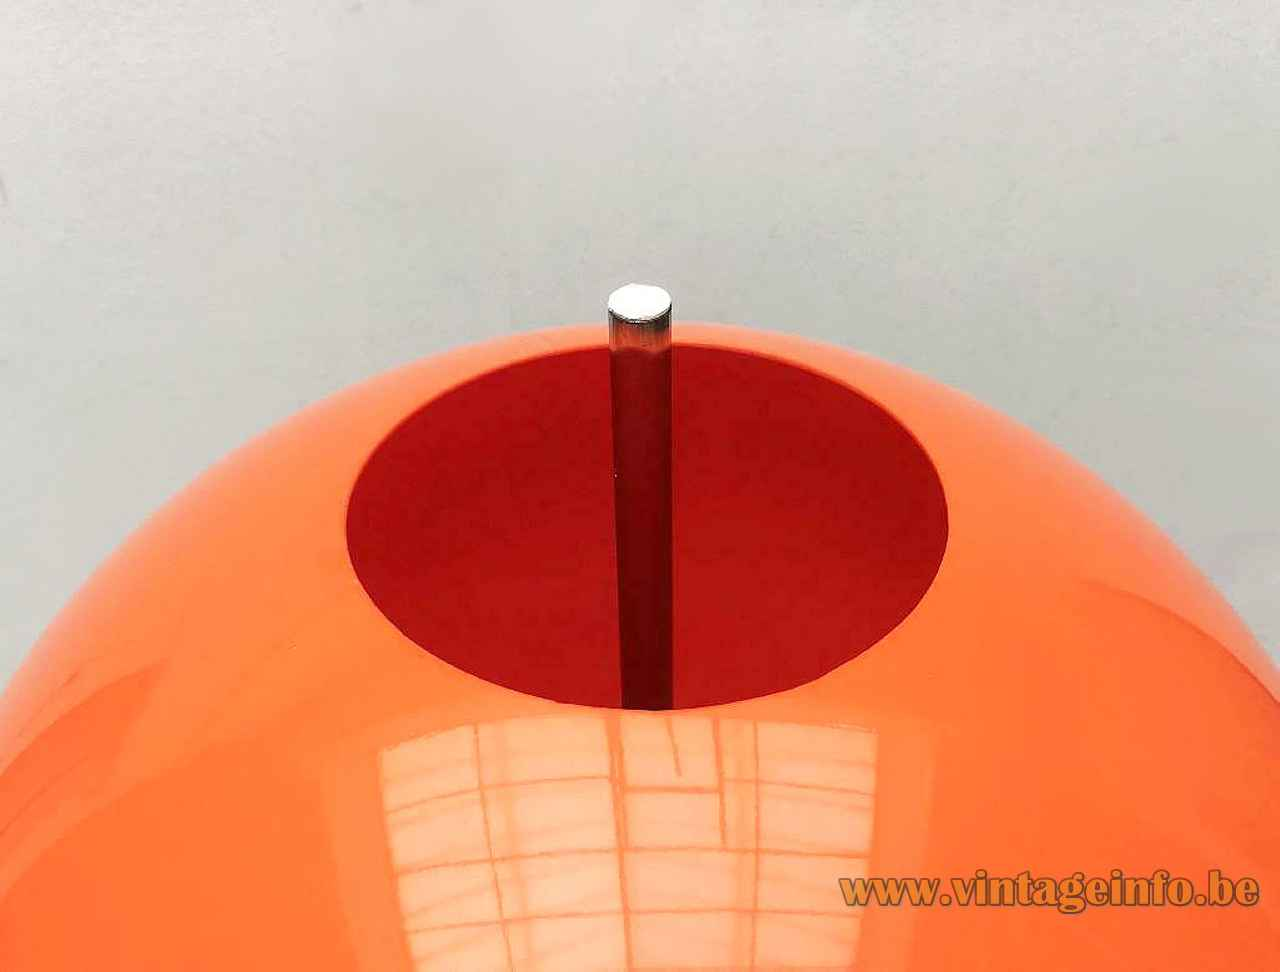 Honsel Leuchten orange globe floor lamp round chrome base & rod acrylic sphere lampshade 1970s Germany